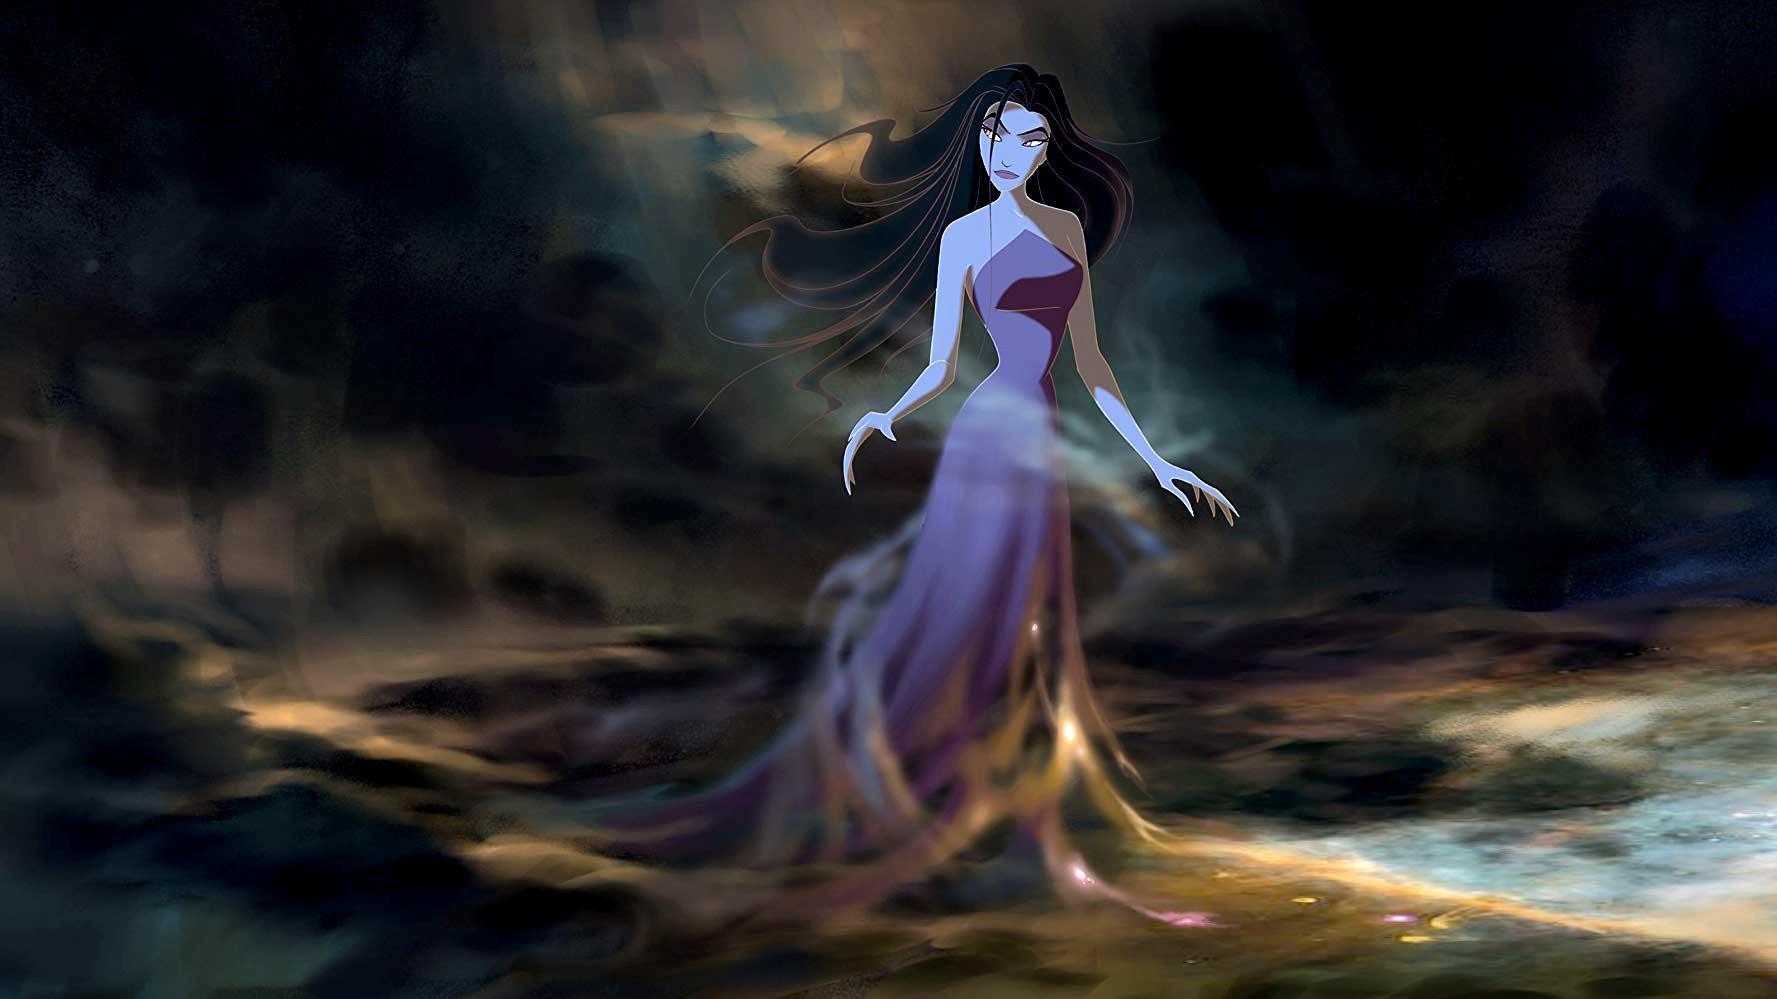 https://www.moriareviews.com/rongulator/wp-content/uploads/Sinbad-Legend-of-the-Seven-Seas-2003-5.jpg